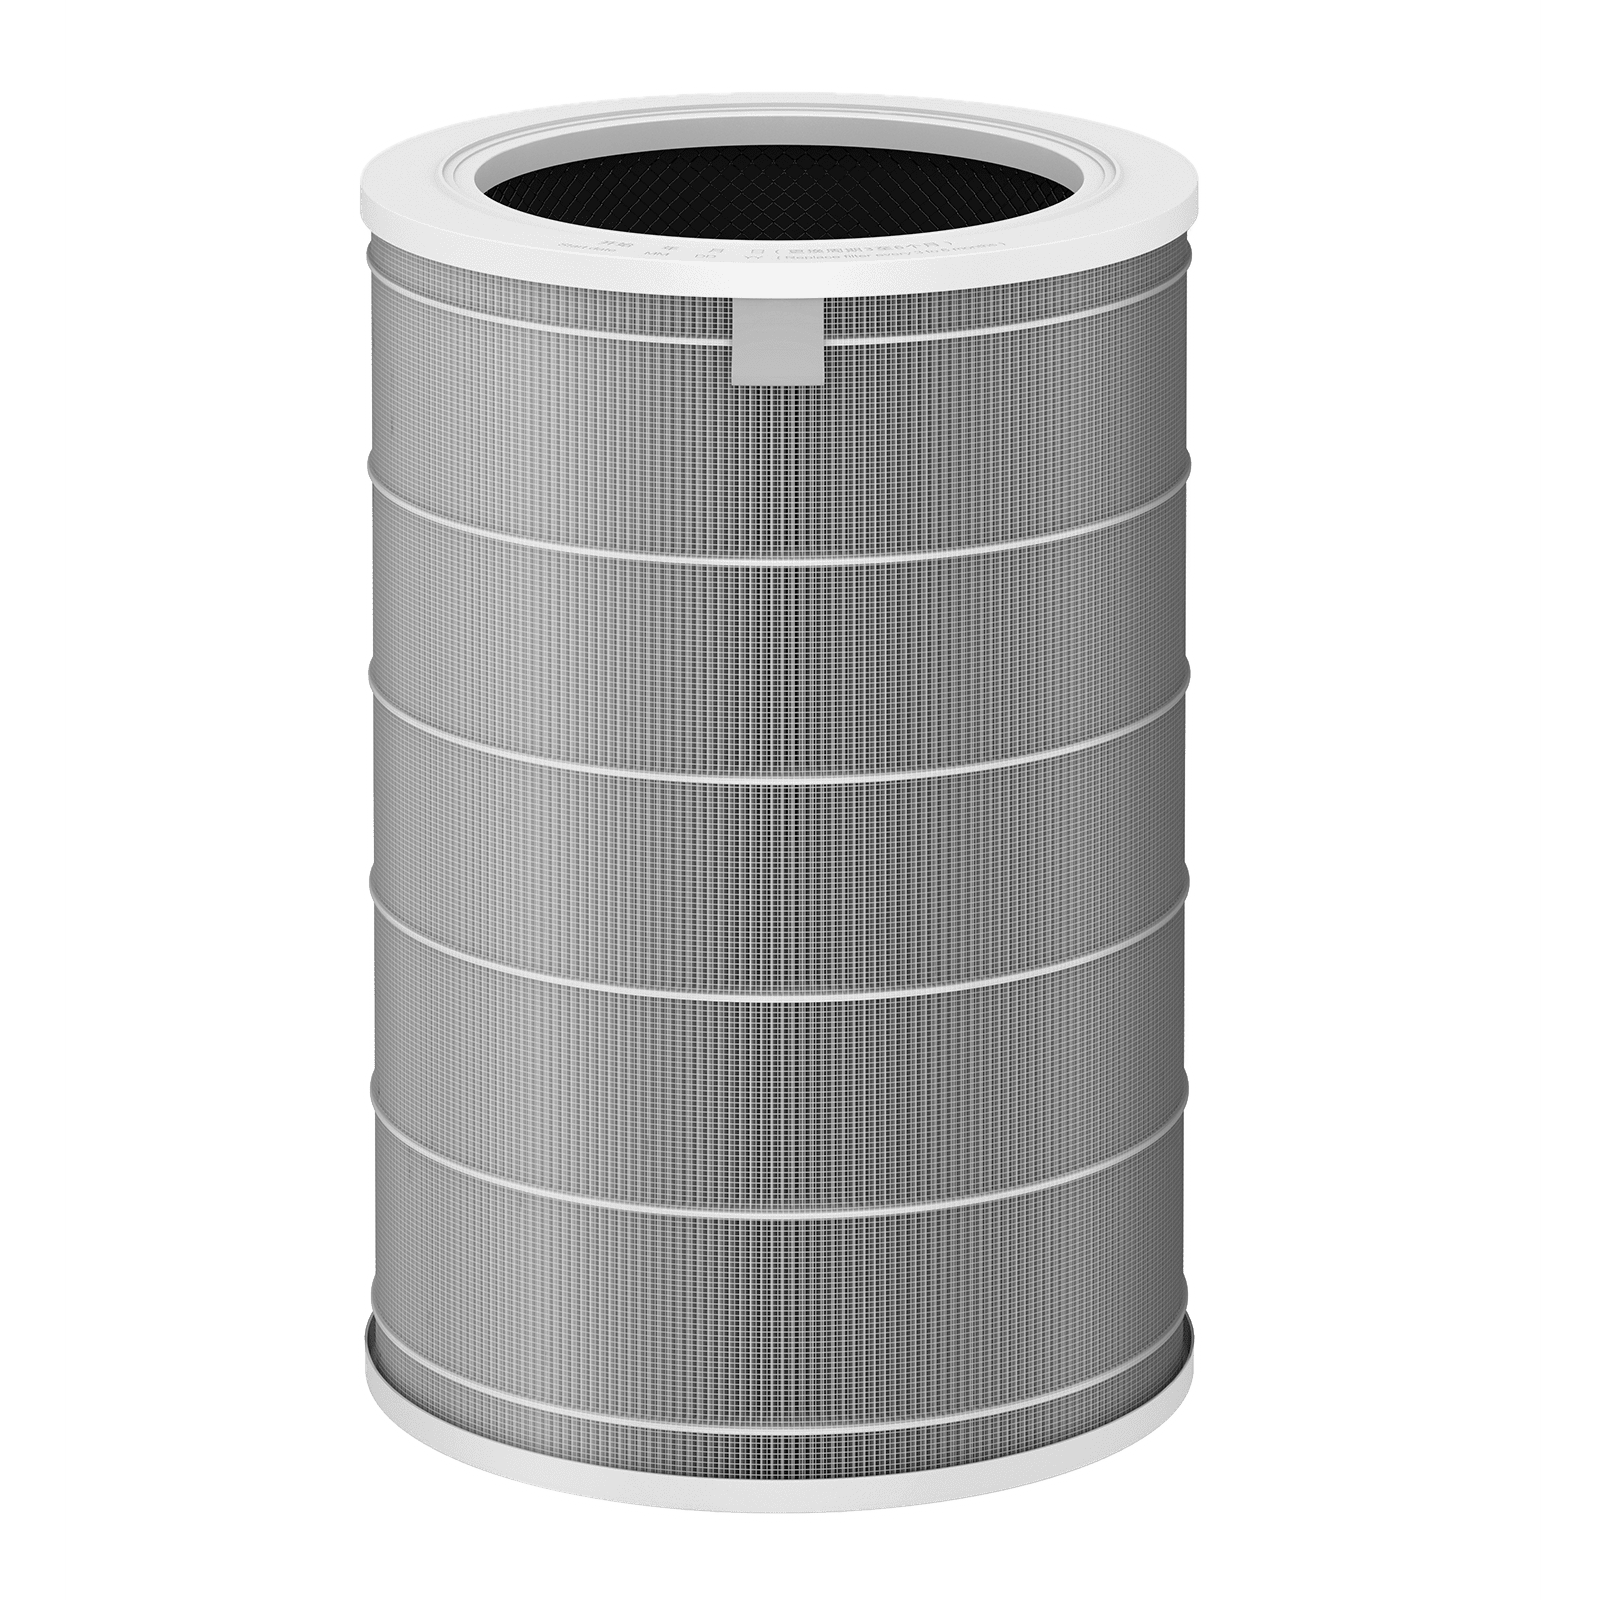 Mi Air Purifier High Efficiency Filter